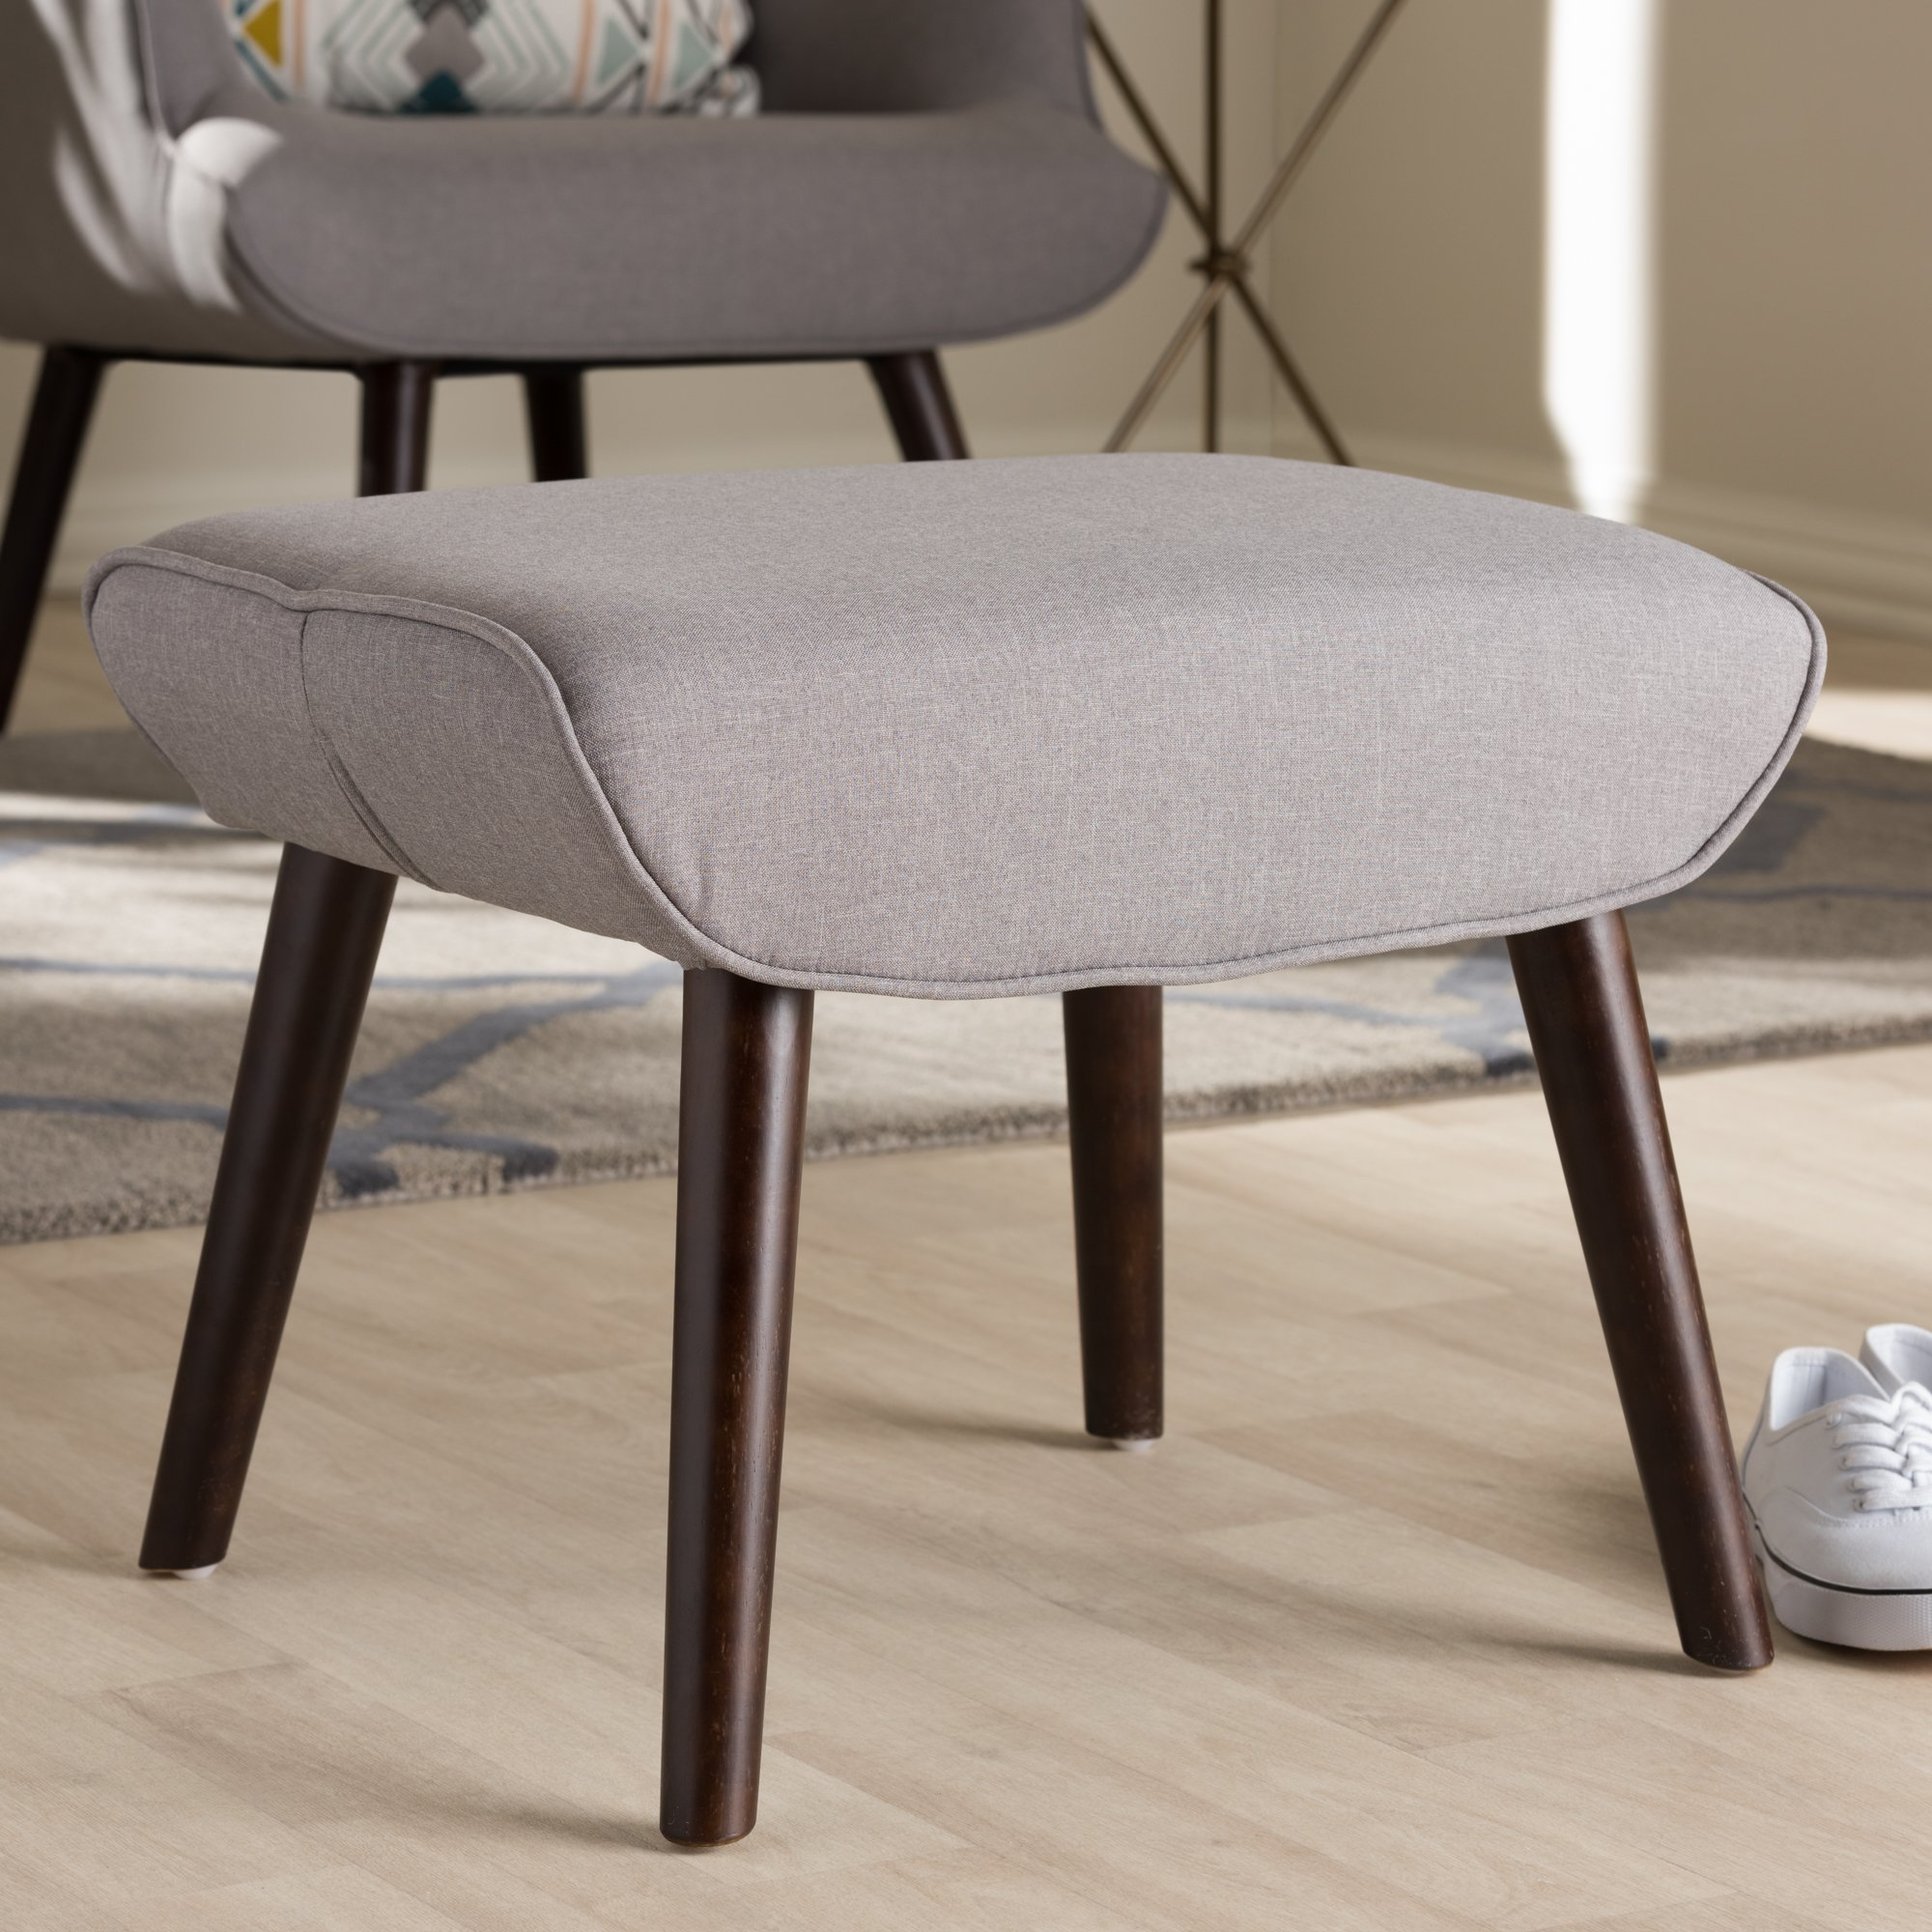 Baxton Studio Alden Mid-Century Modern Light Grey Fabric Upholstered Dark Brown Finished Wood Ottoman/Dark Wood/Mid-Century/Grey/Fabric Polyester 100''/Rubber Wood/Foam